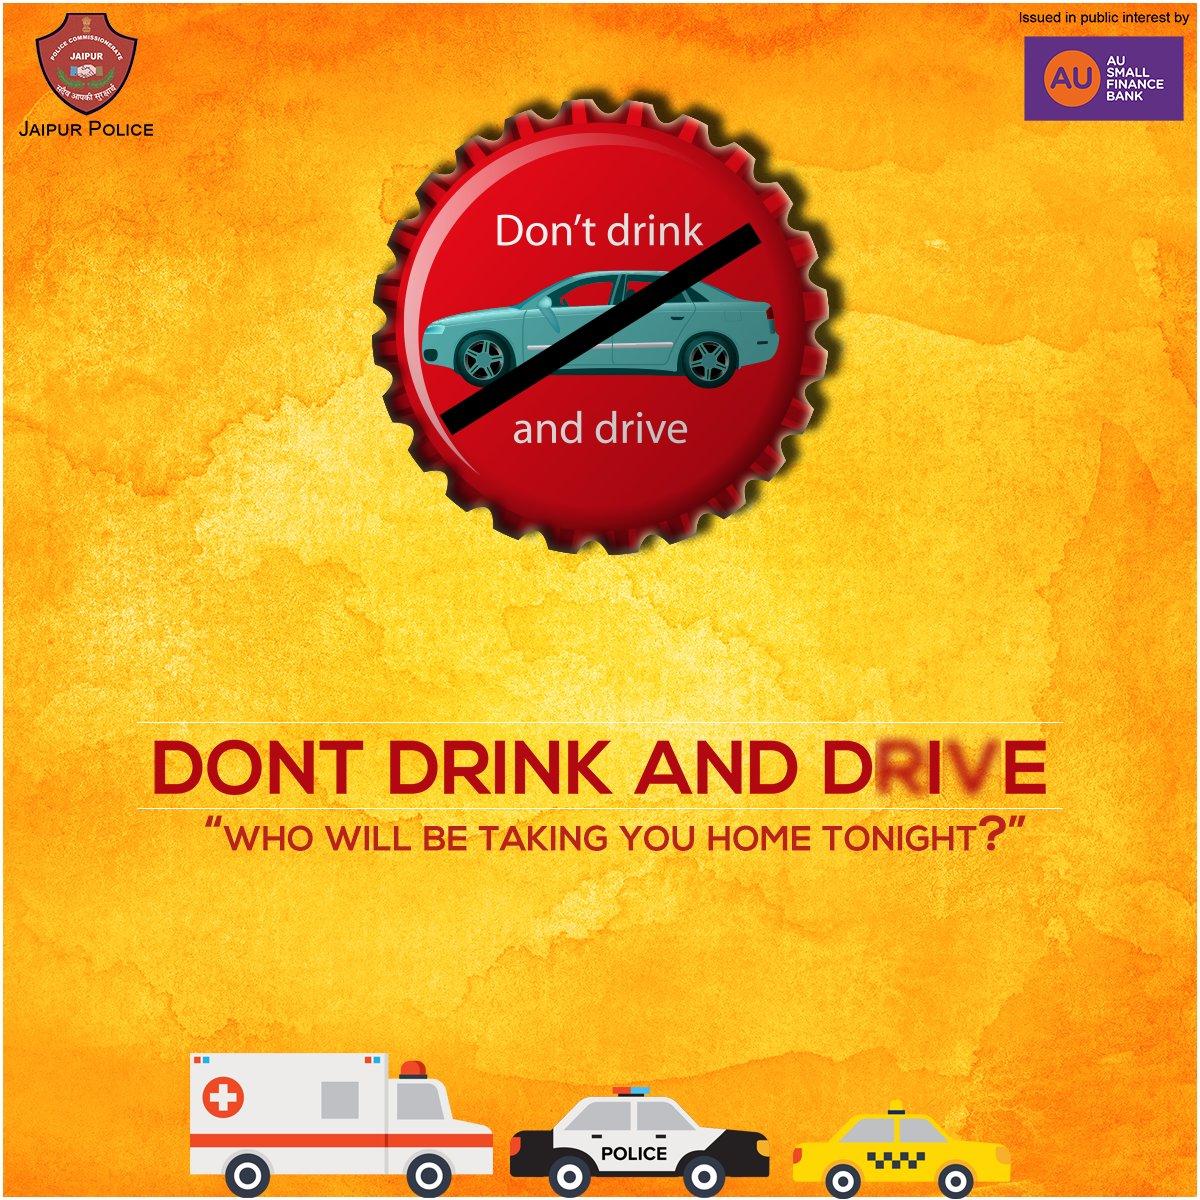 Who will be taking you home tonight? #DontDrinkAndDrive #JaipurPolice #SafeJaipur #SafetyFirst #BeAlert #BeSafe.<br>http://pic.twitter.com/pN5AnajgH0